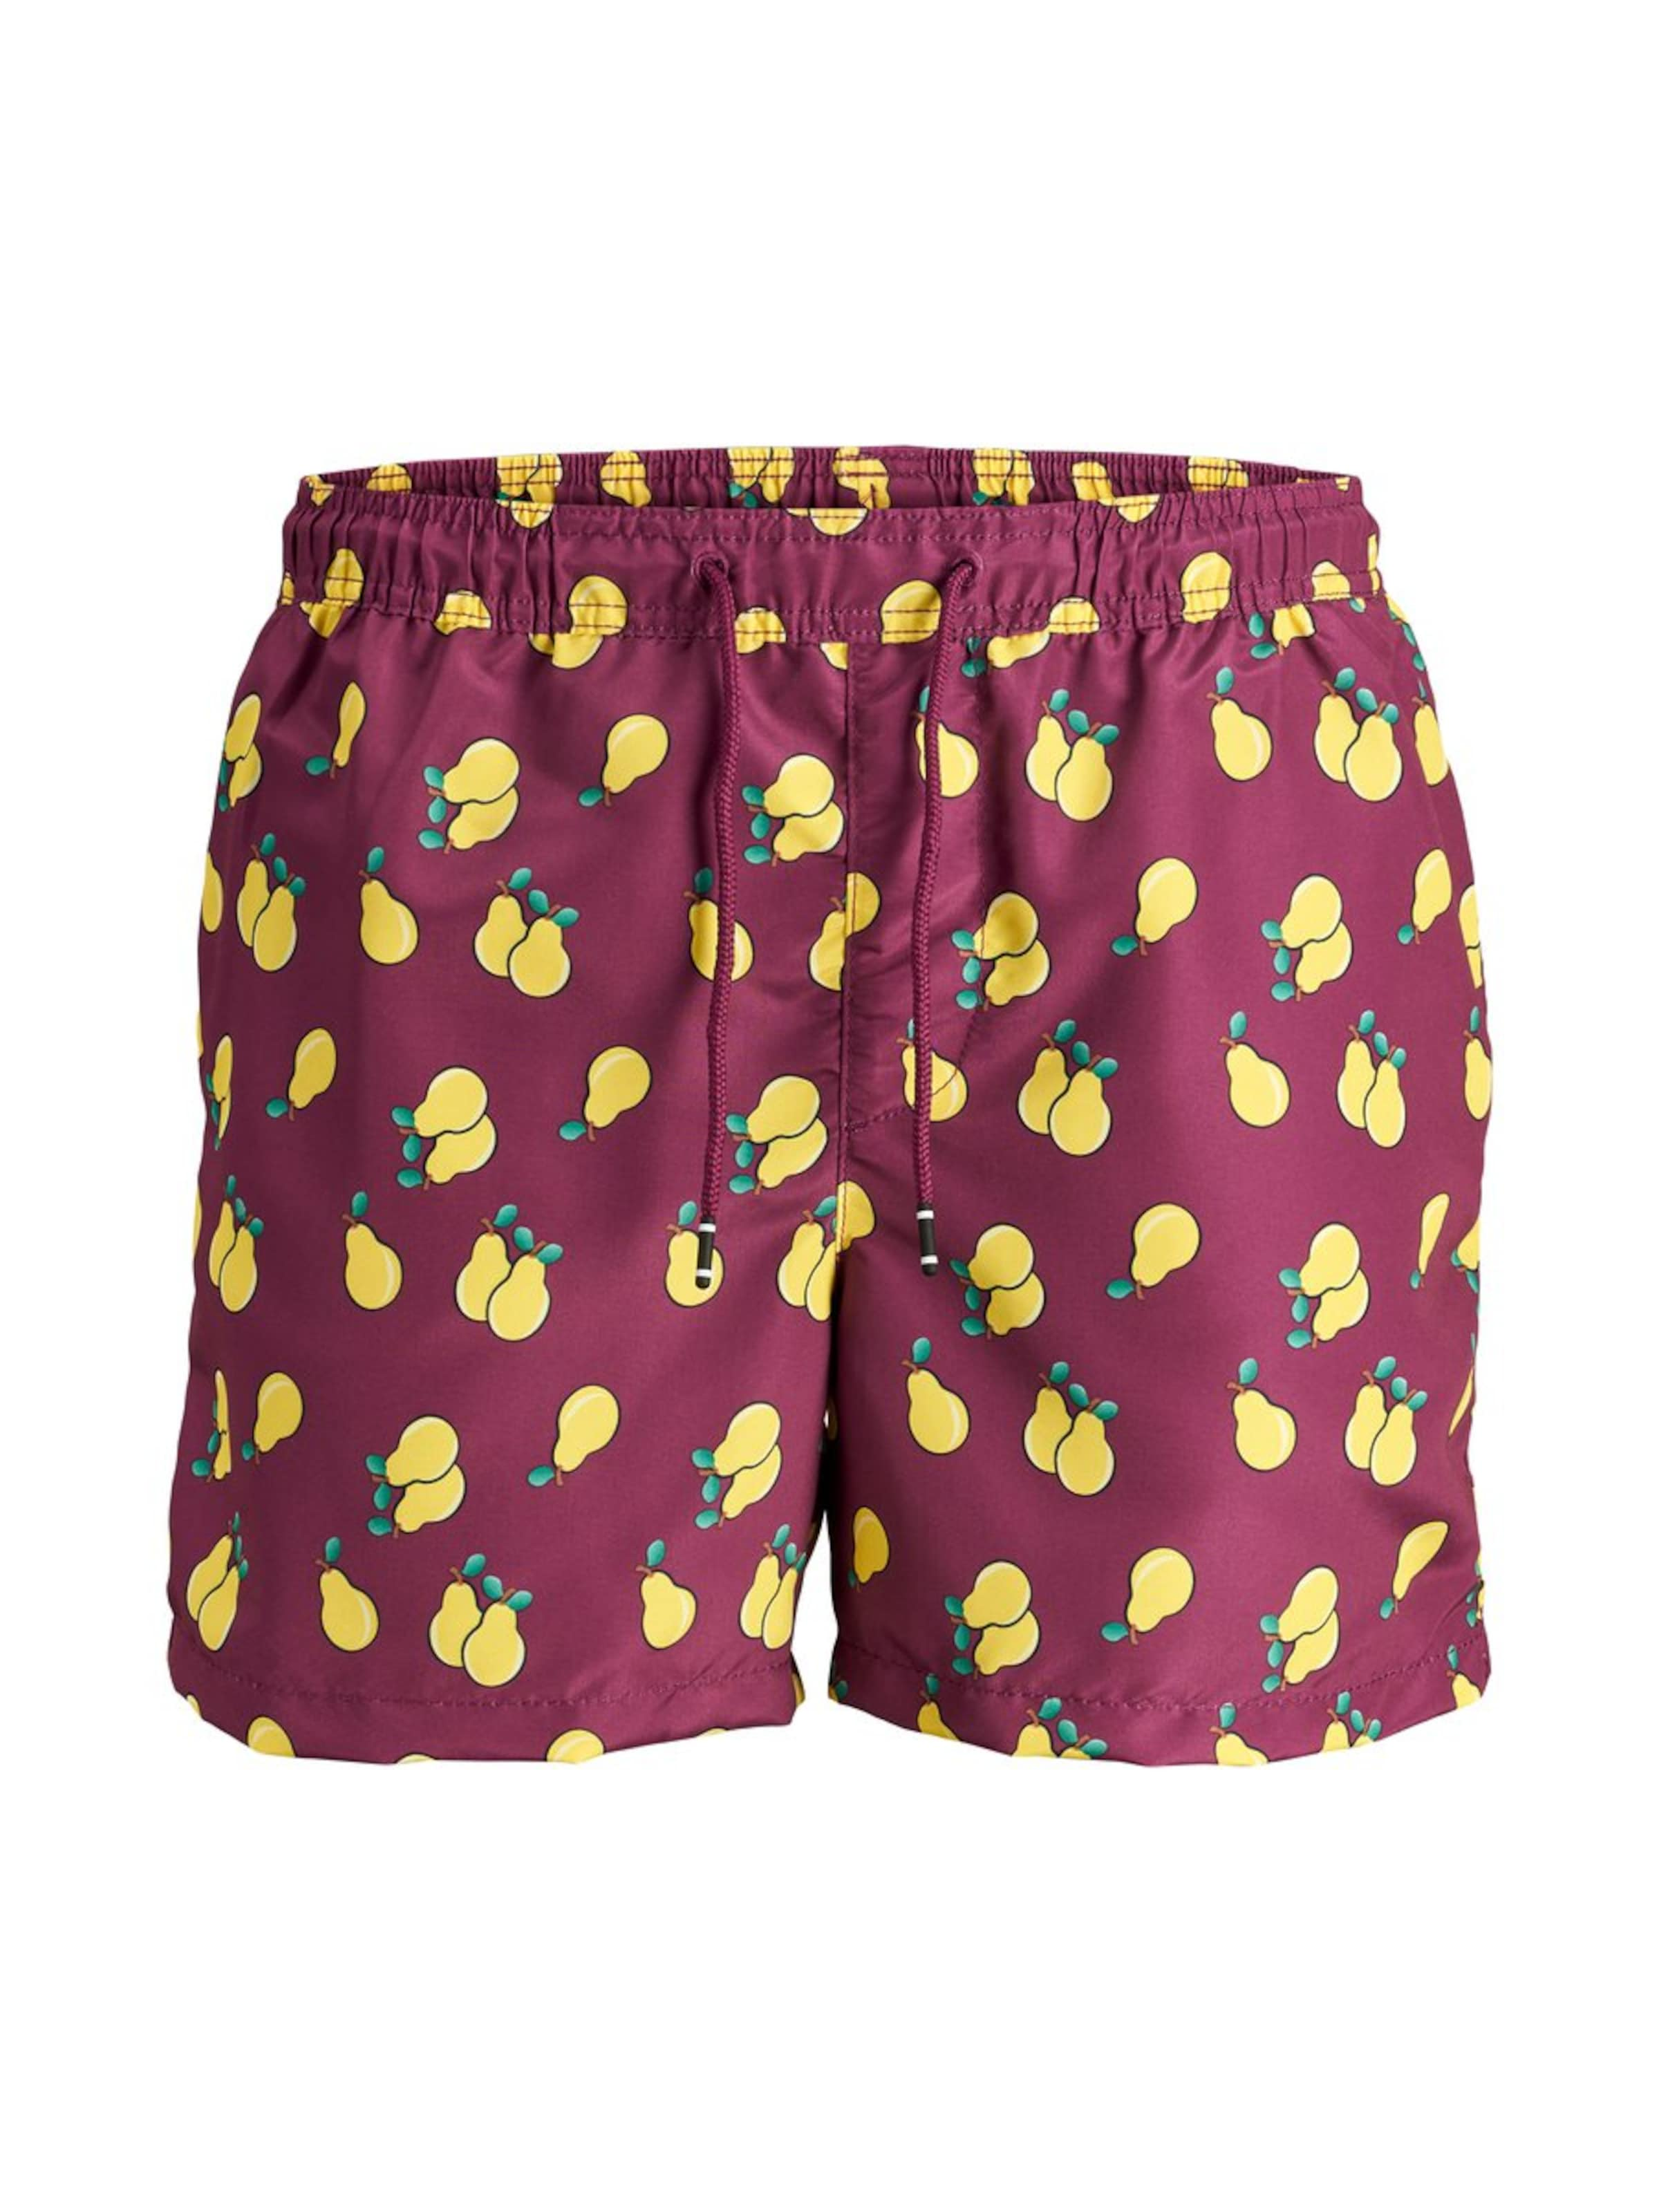 'jjicali Fruit' De Jackamp; Jjswim Basalte Shorts Bain En Jones Akm MarronGris Yyb6fg7v